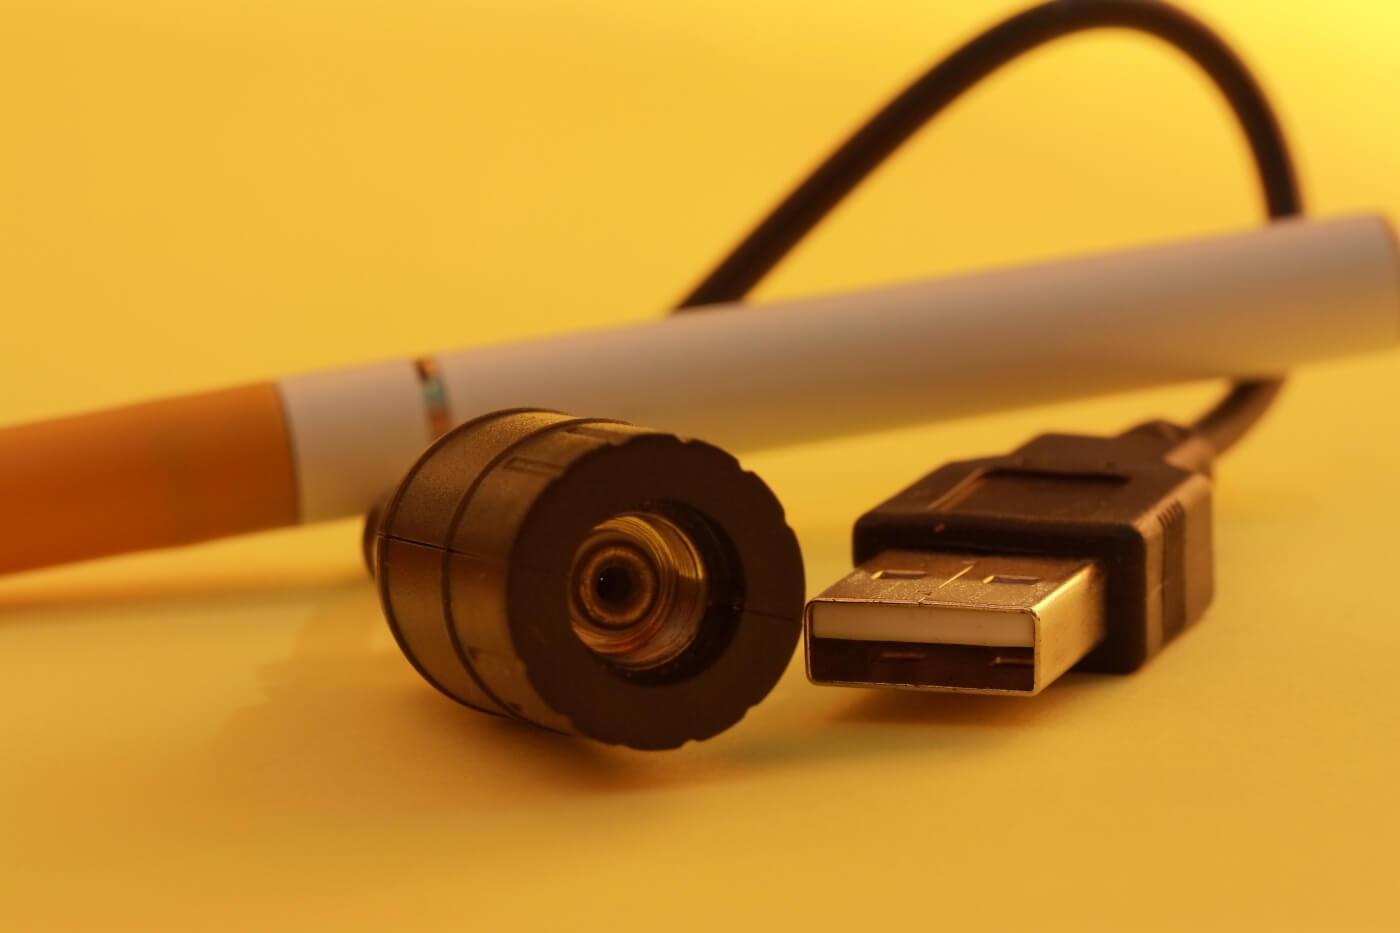 e-Zigarette (c) Gisela Peter / pixelio.de